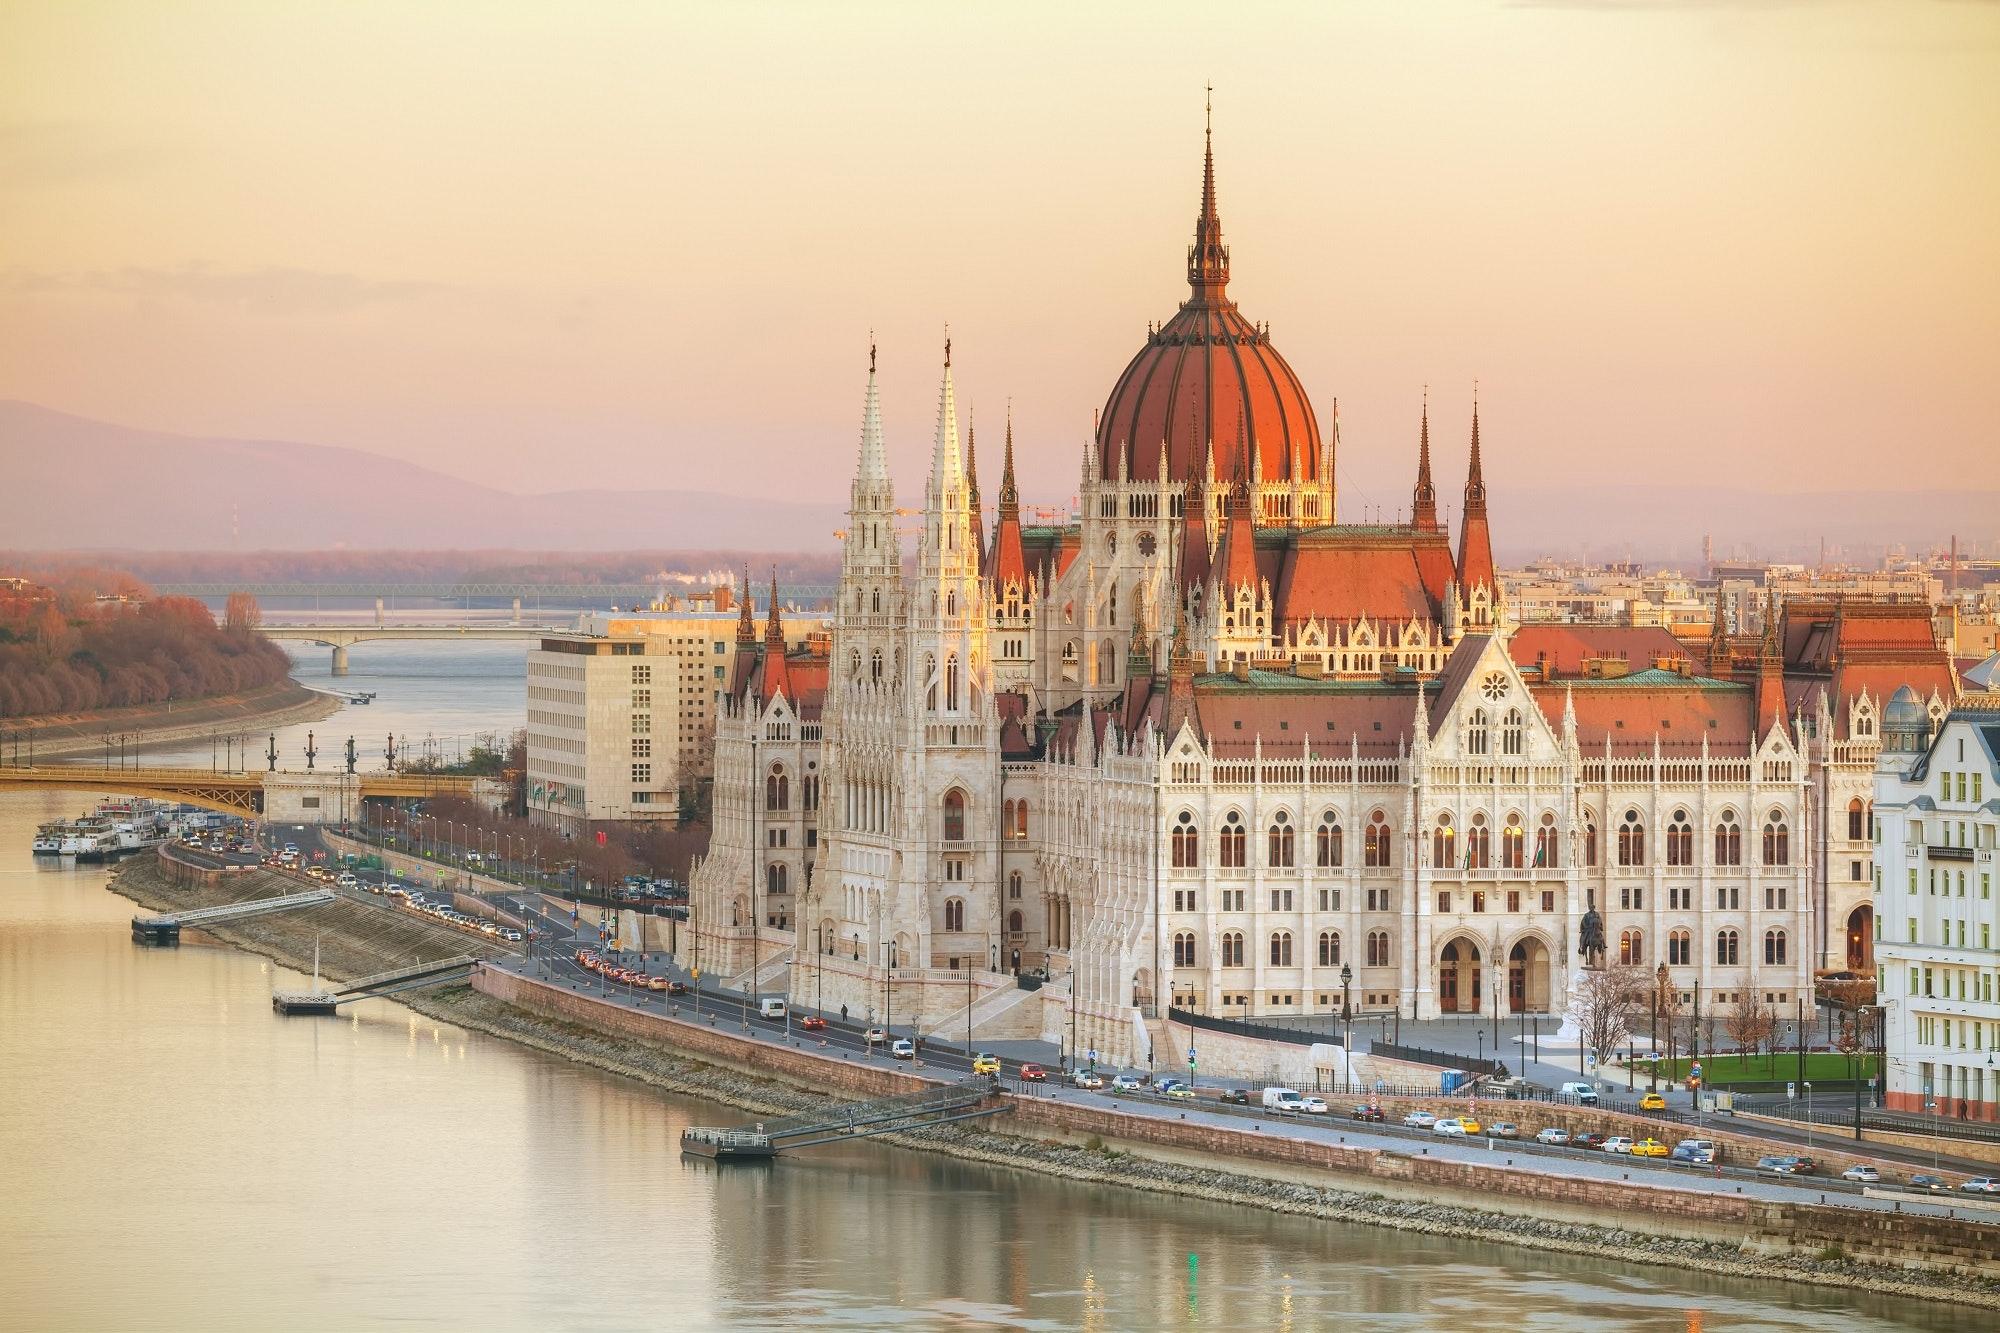 Budapest's dazzling Parliament building